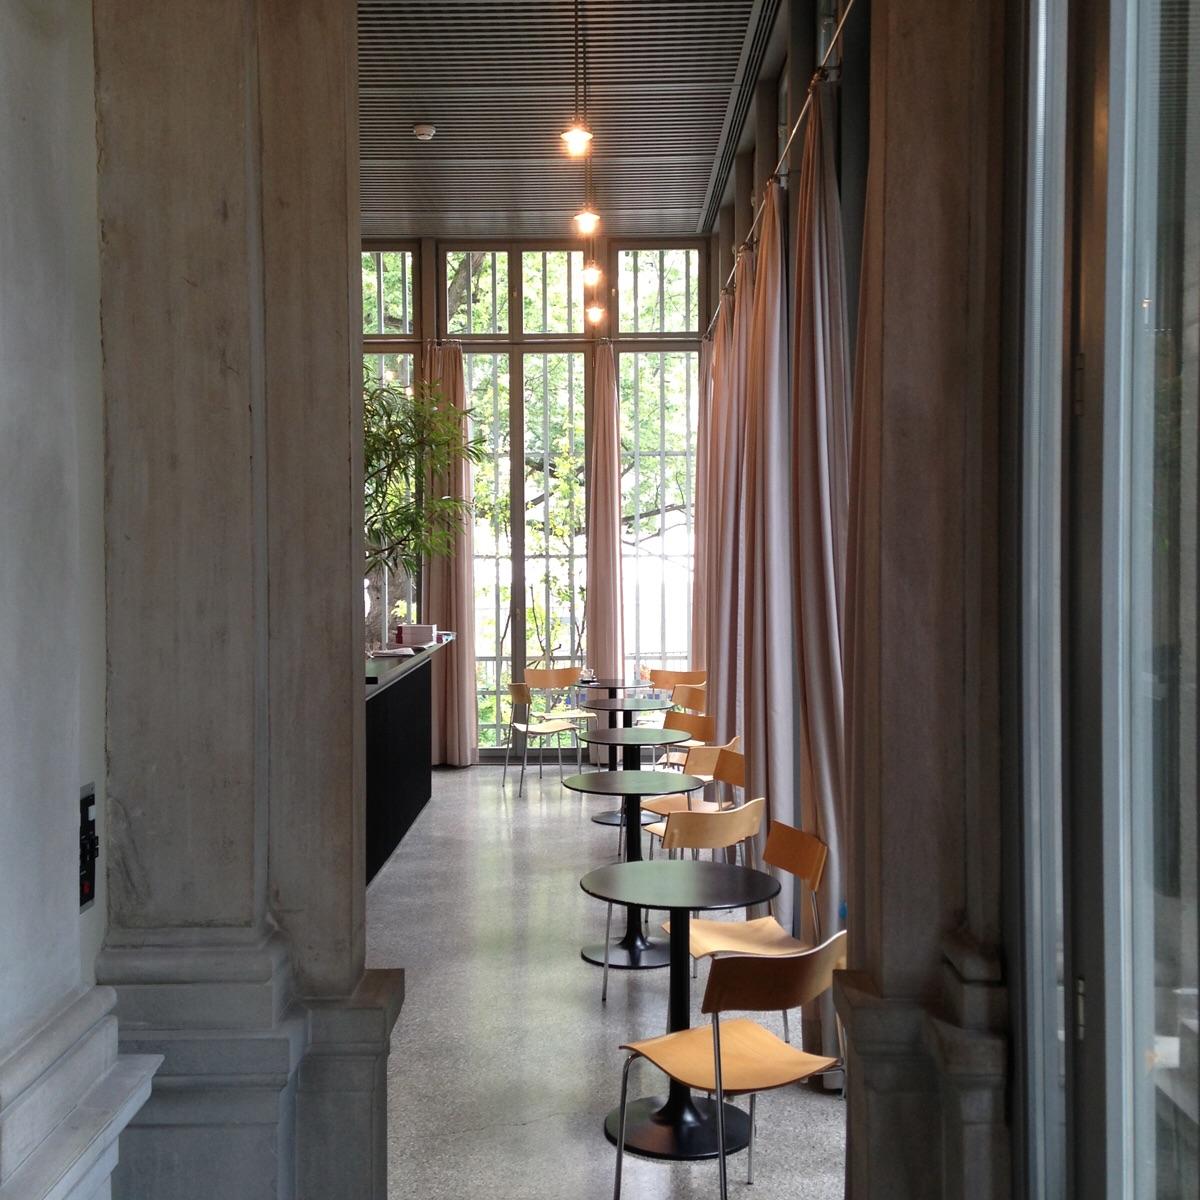 Cafe at the Chur Art museum. Chur Switzerland. (Zumthor 1990)